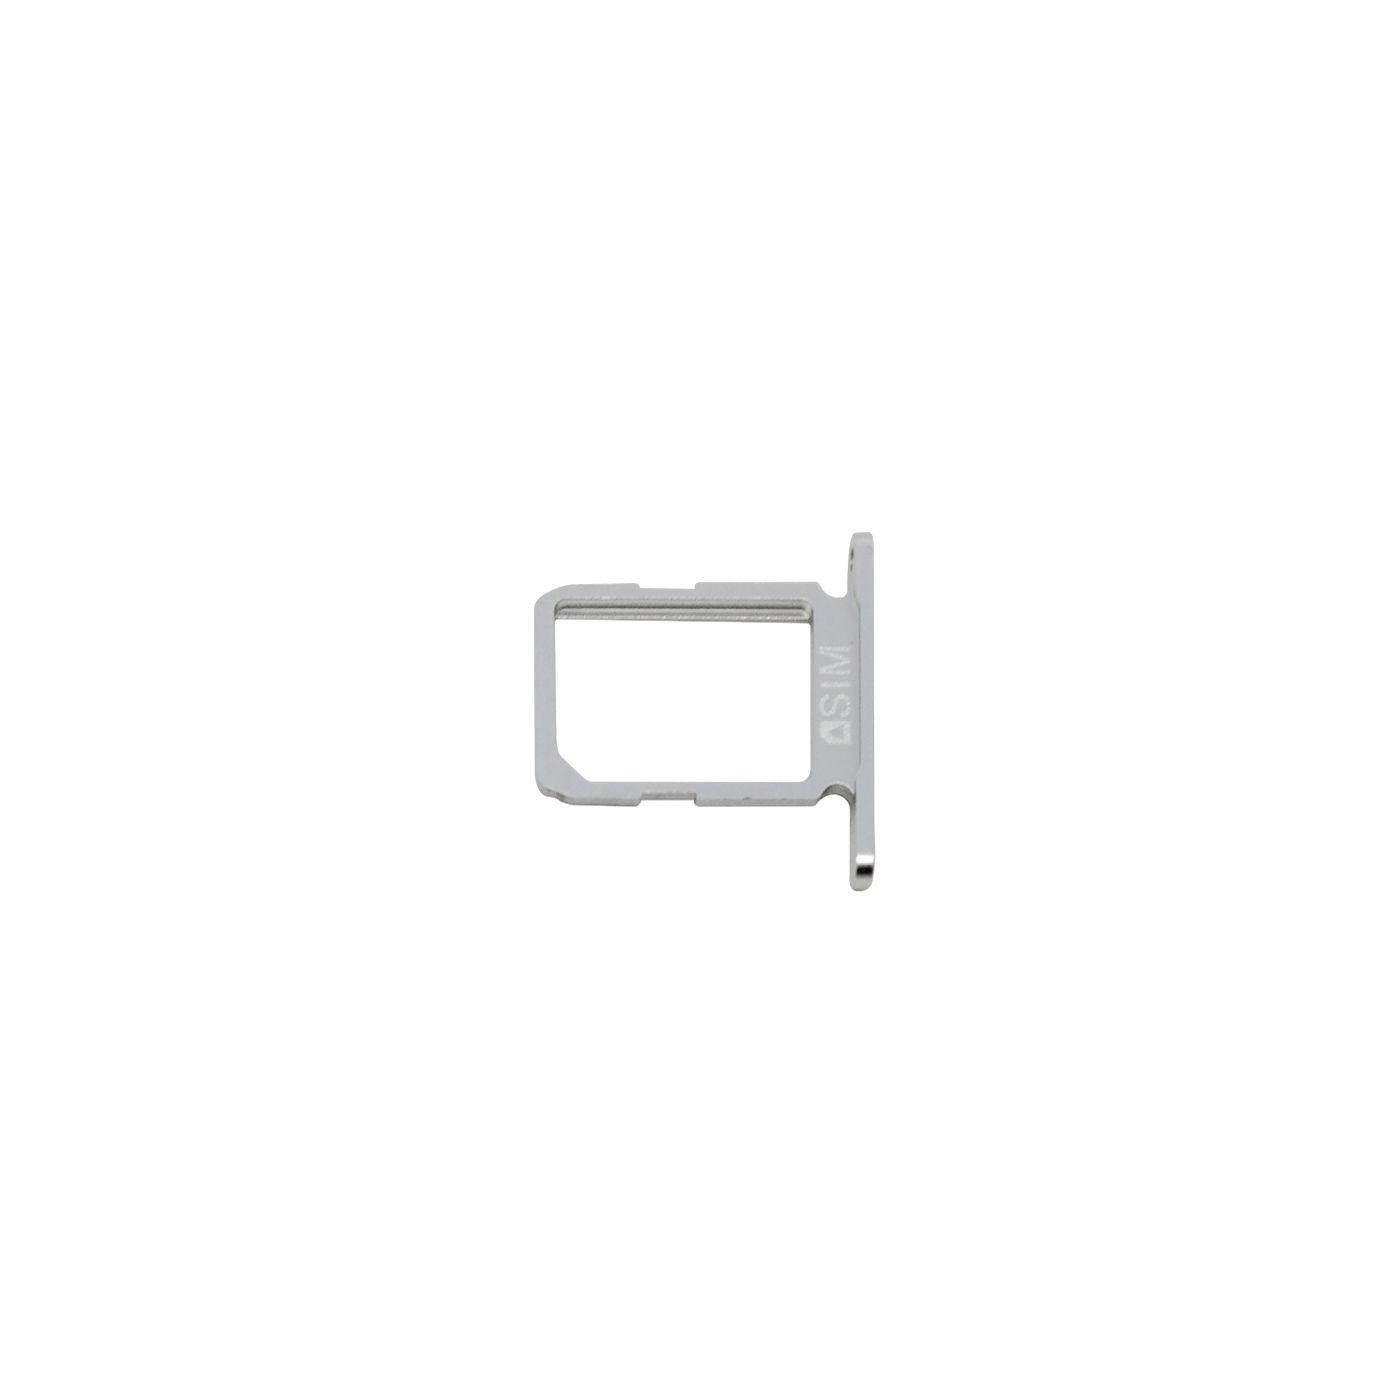 Support de carte SIM Silver Samsung Galaxy S6 SM-G920F Blanc Remplacement